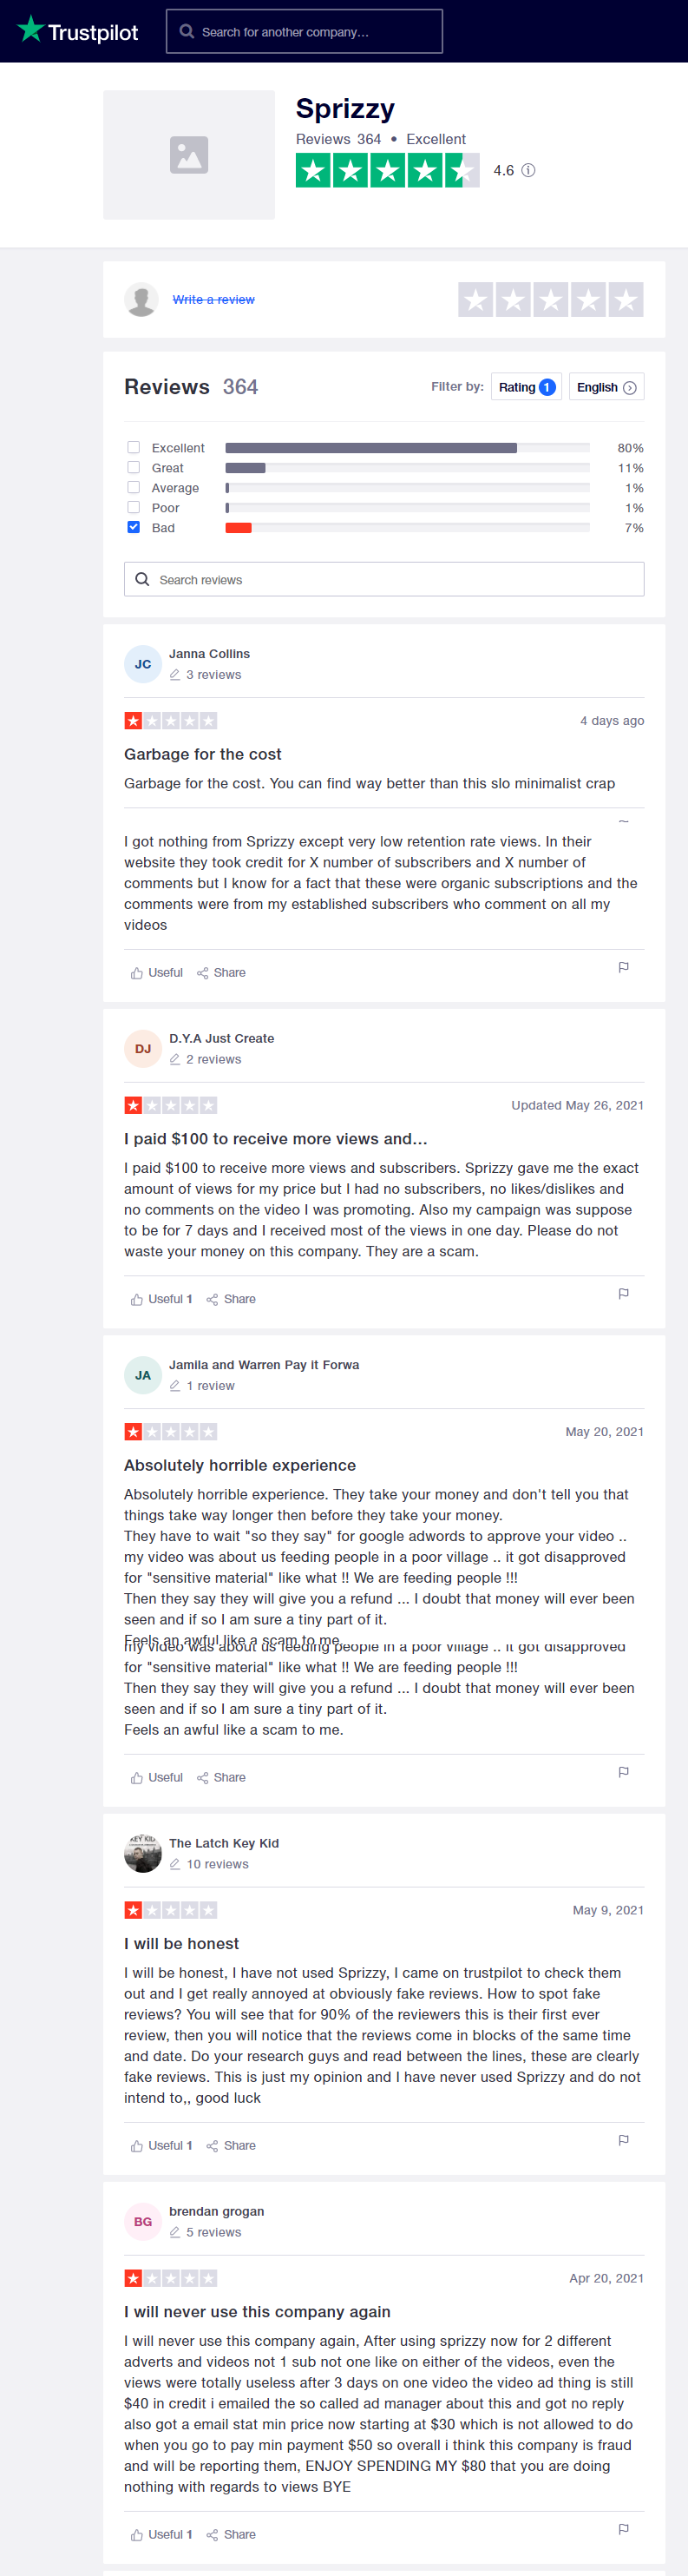 Sprizzy Trustpilot Reviews